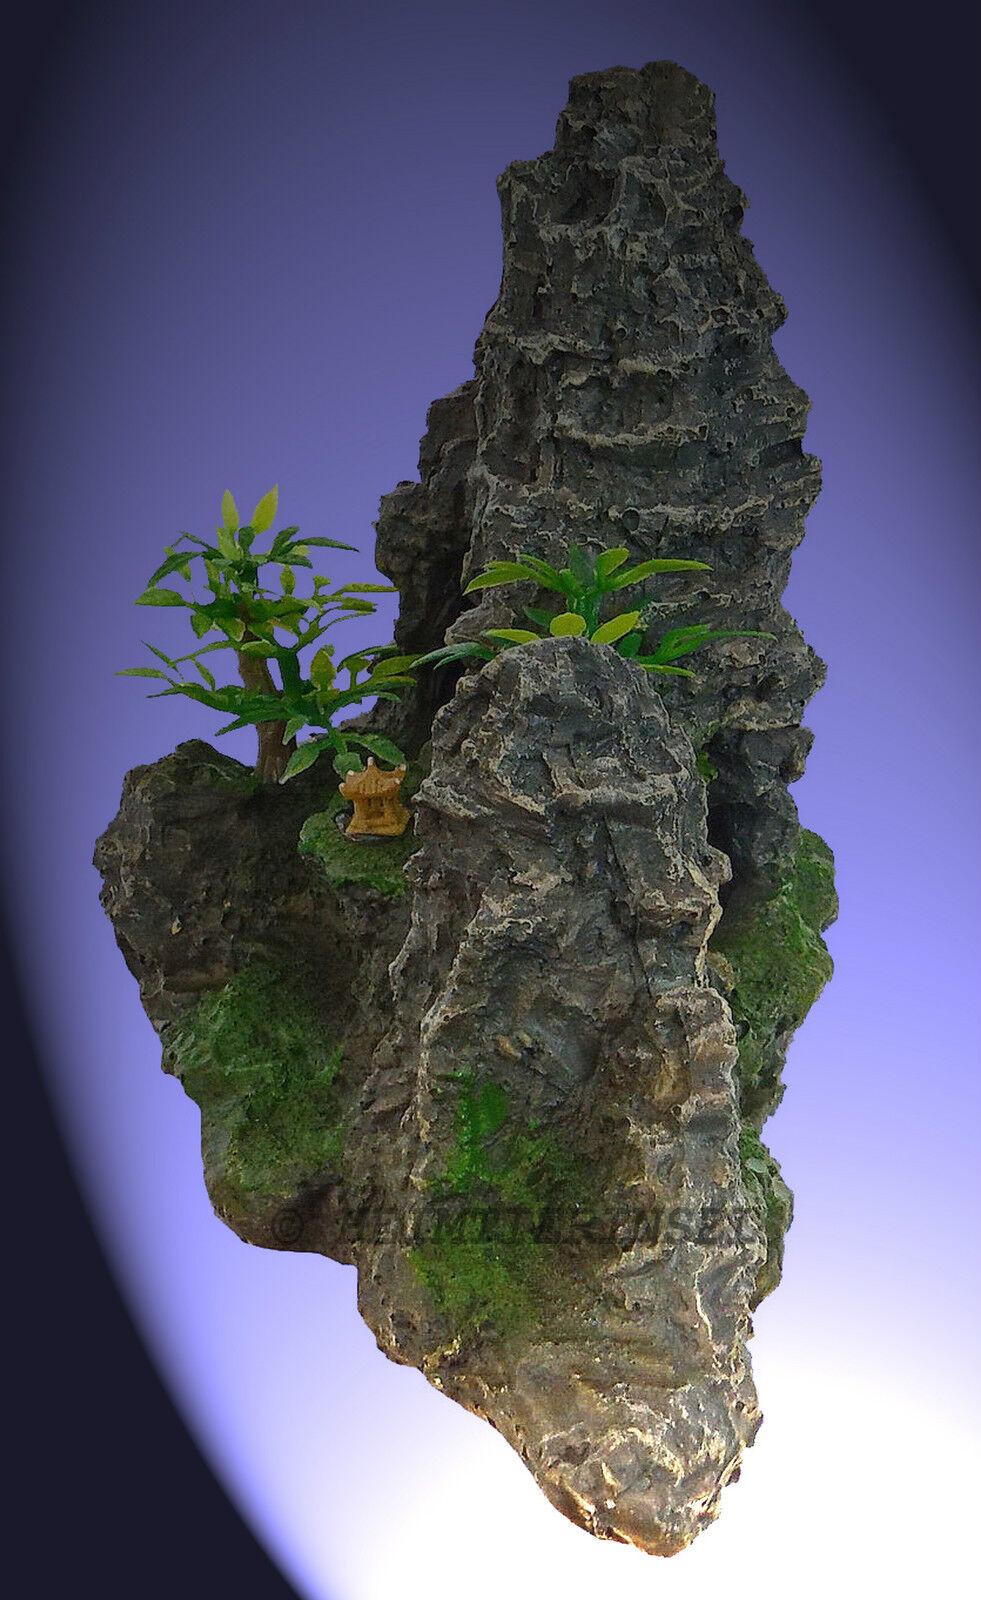 aquarium deko grotten h hle stein terrarium dekoration zubeh r barsche eur 8 98 picclick de. Black Bedroom Furniture Sets. Home Design Ideas